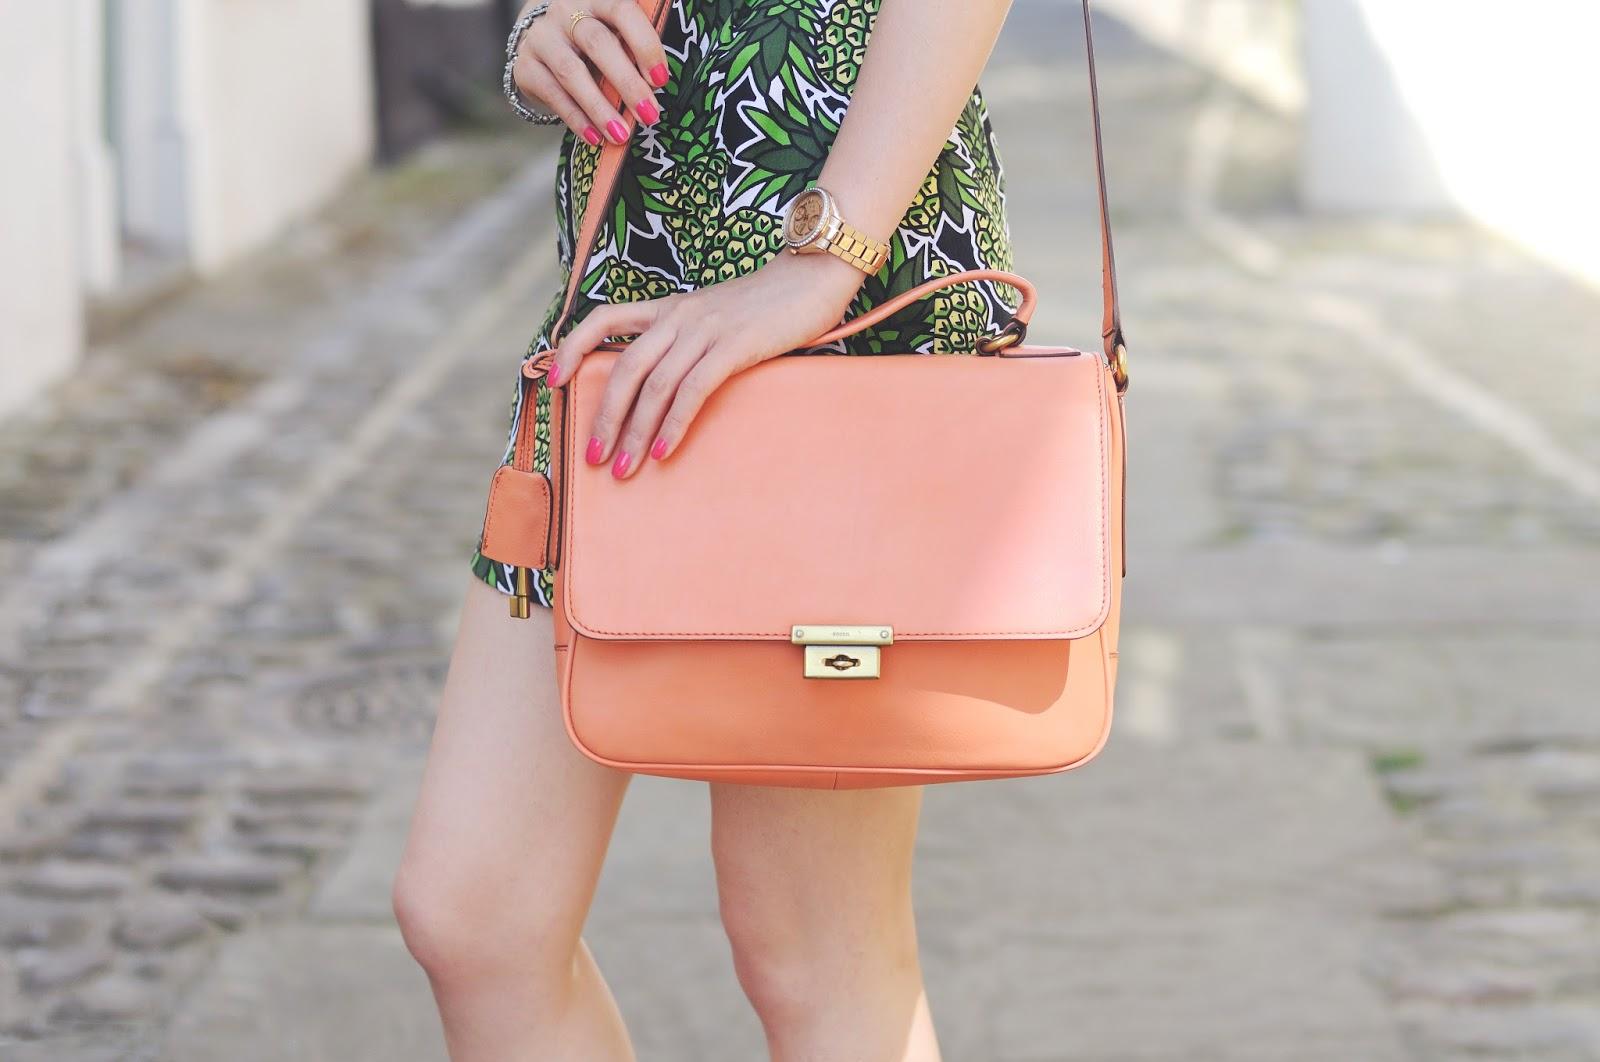 what to wear with orange handbag, how to style orange handbag